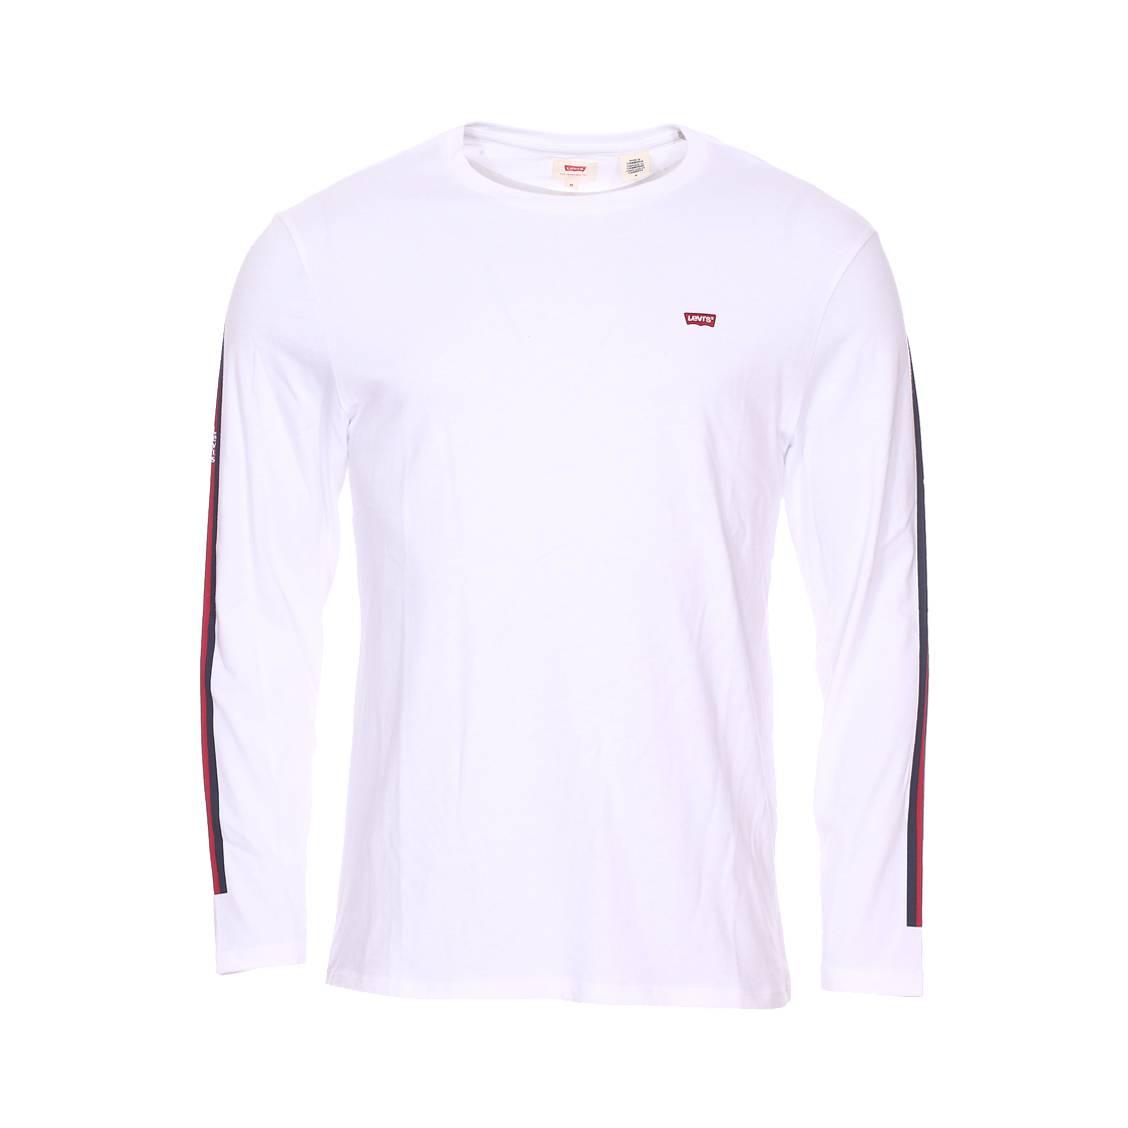 d5962940298ca levi s Tee-shirt manches longues